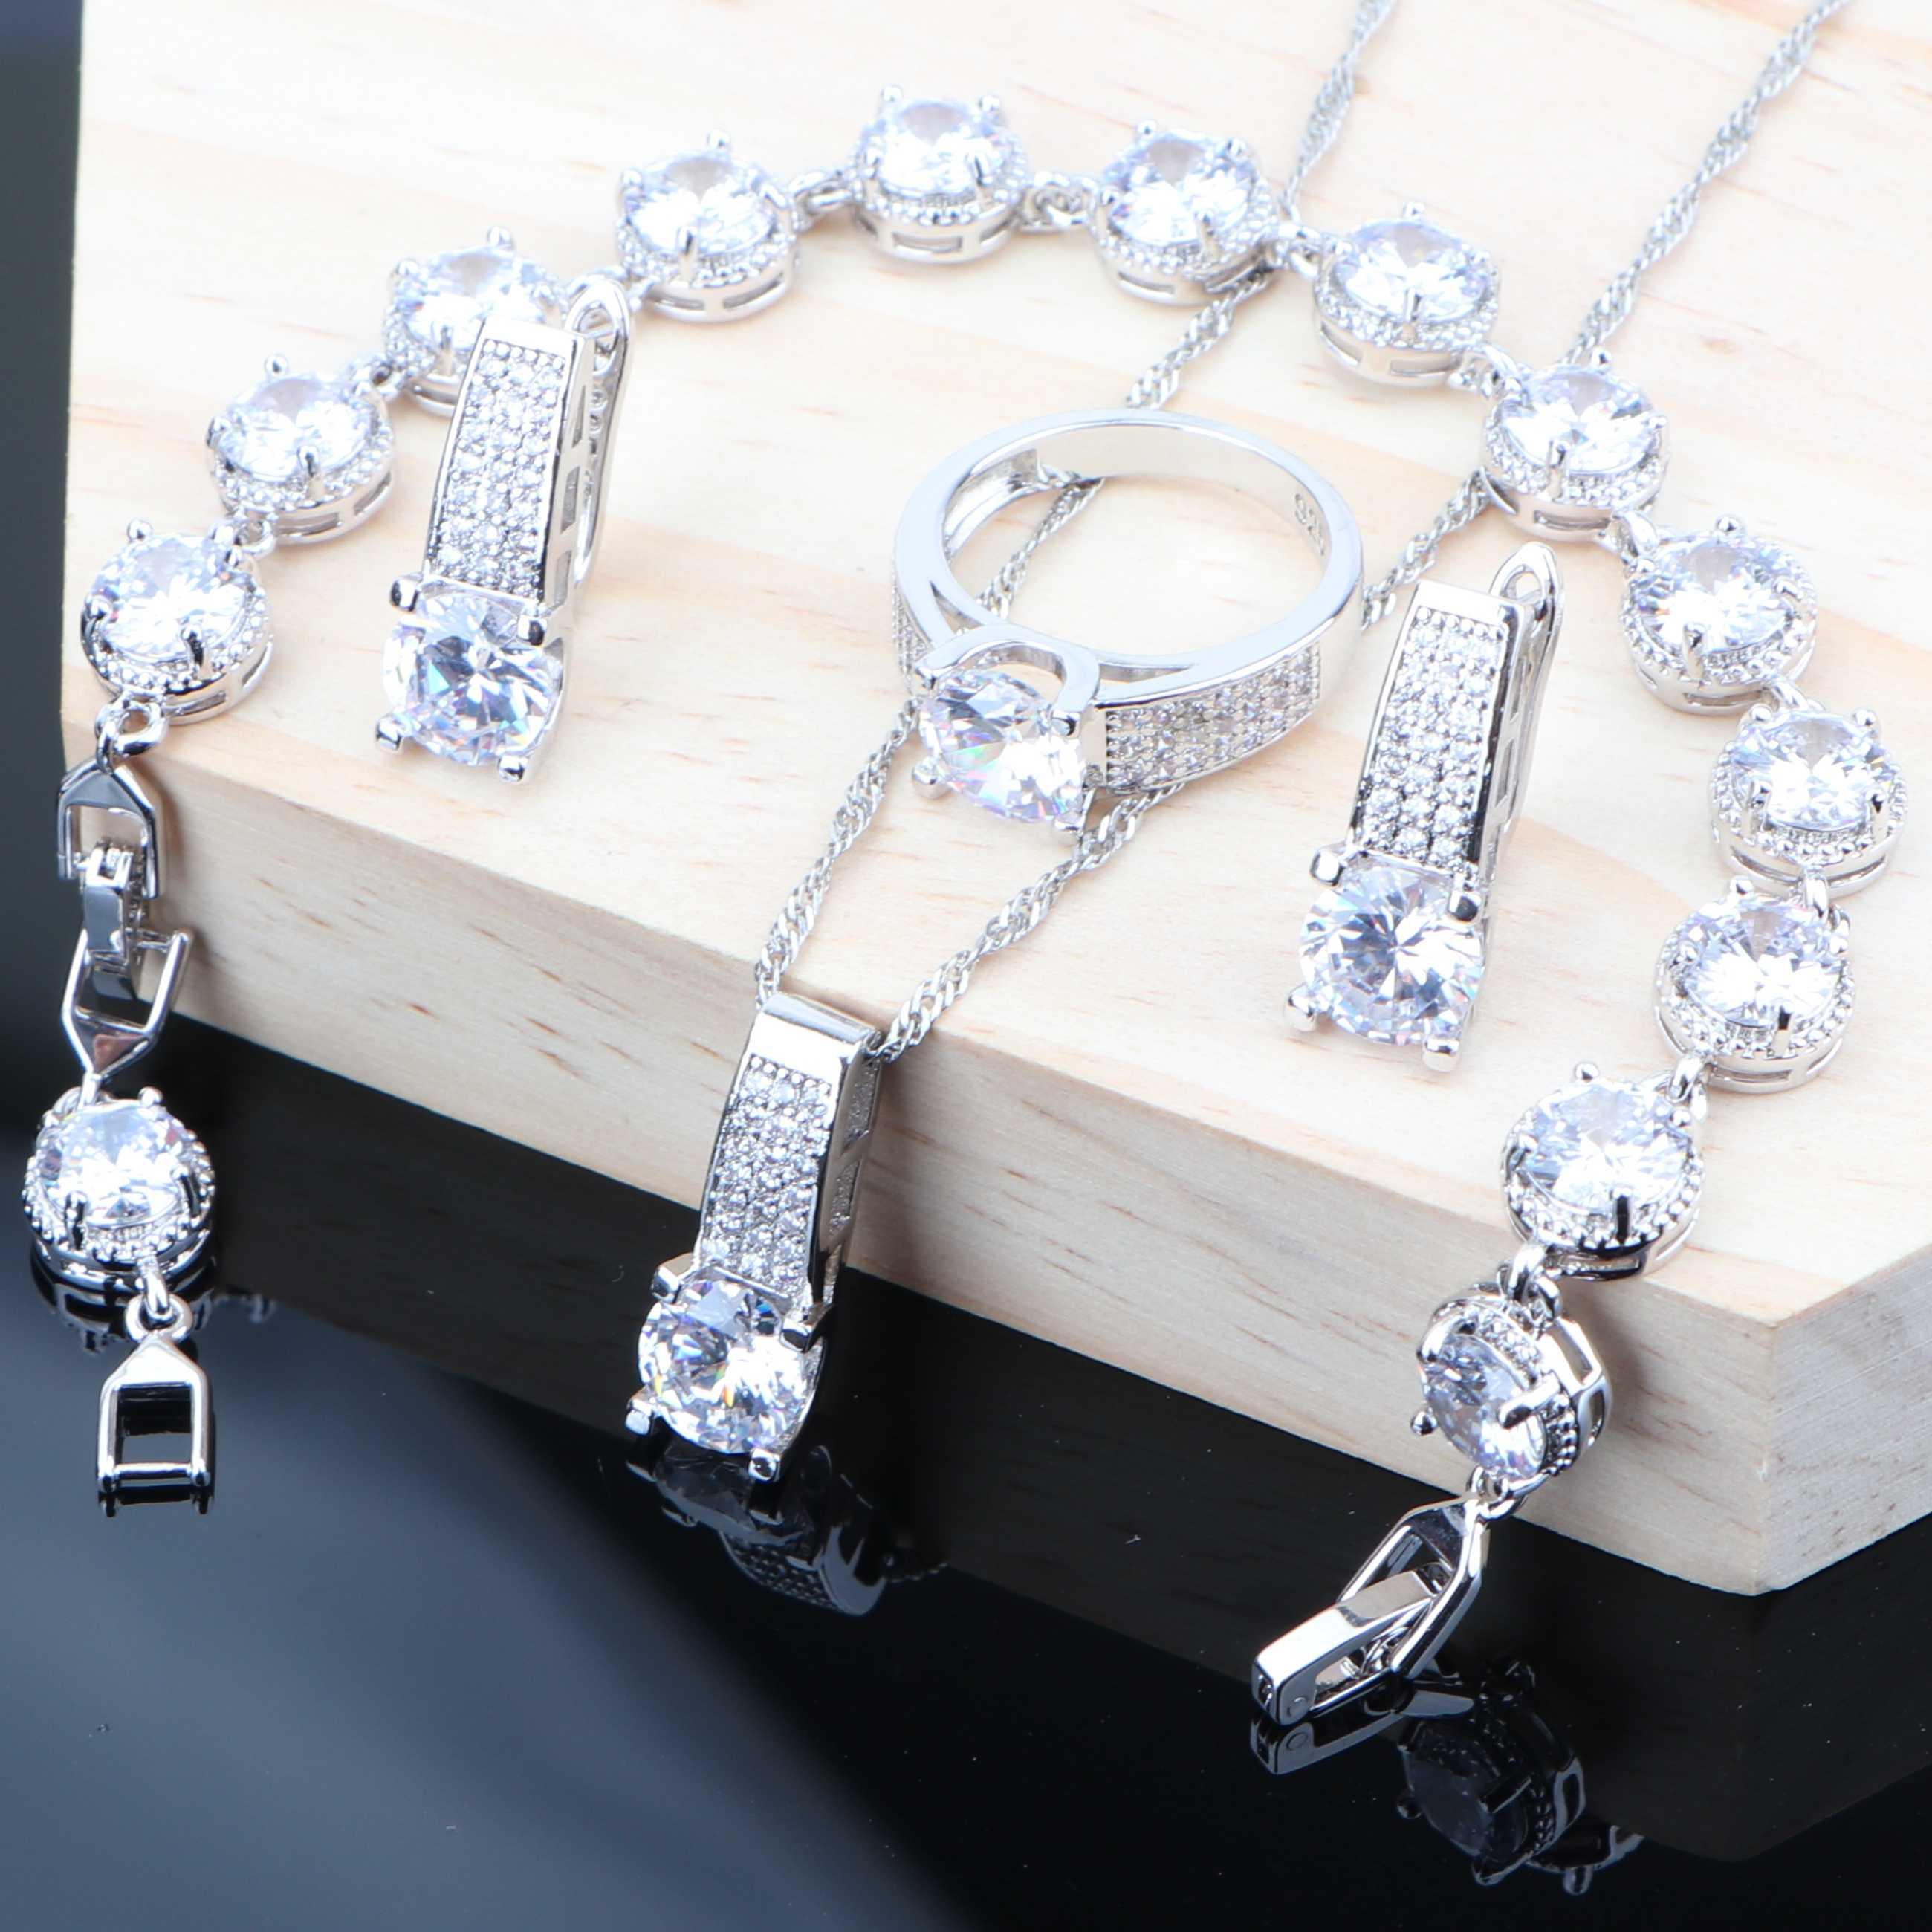 925 prata branco zircônia cúbica conjuntos de jóias de fantasia para mulheres brincos de casamento pulseira de anel de jóias de noiva colar conjuntos